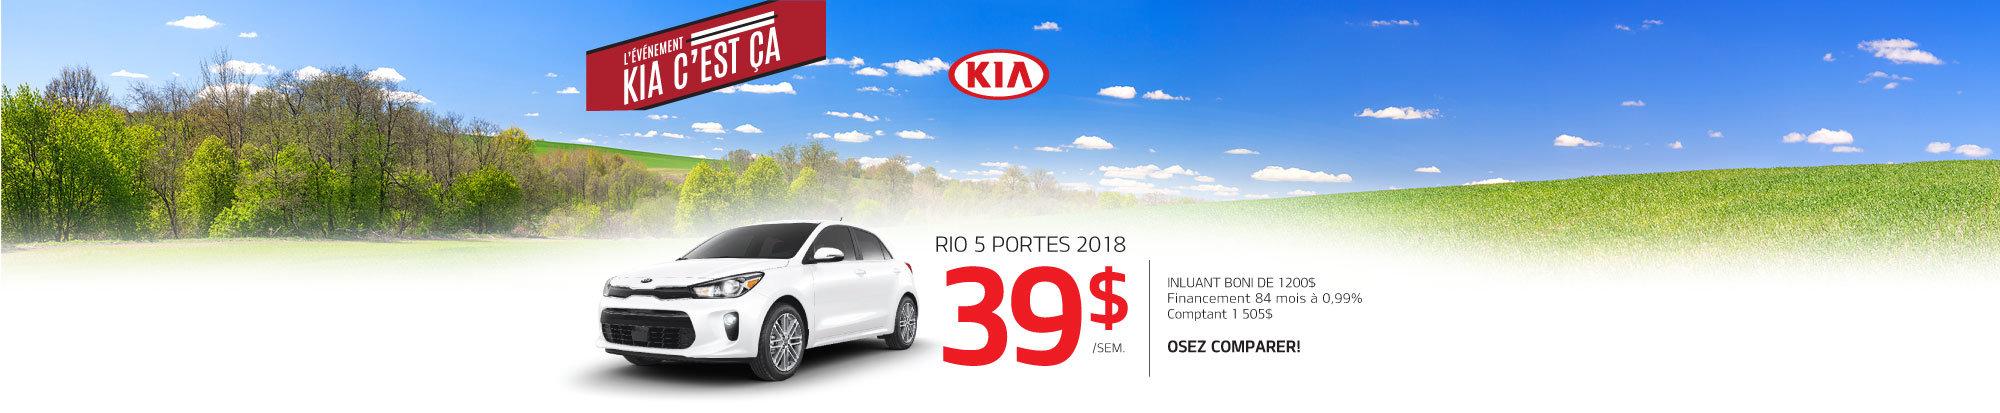 Rio 5 portes 2018 web